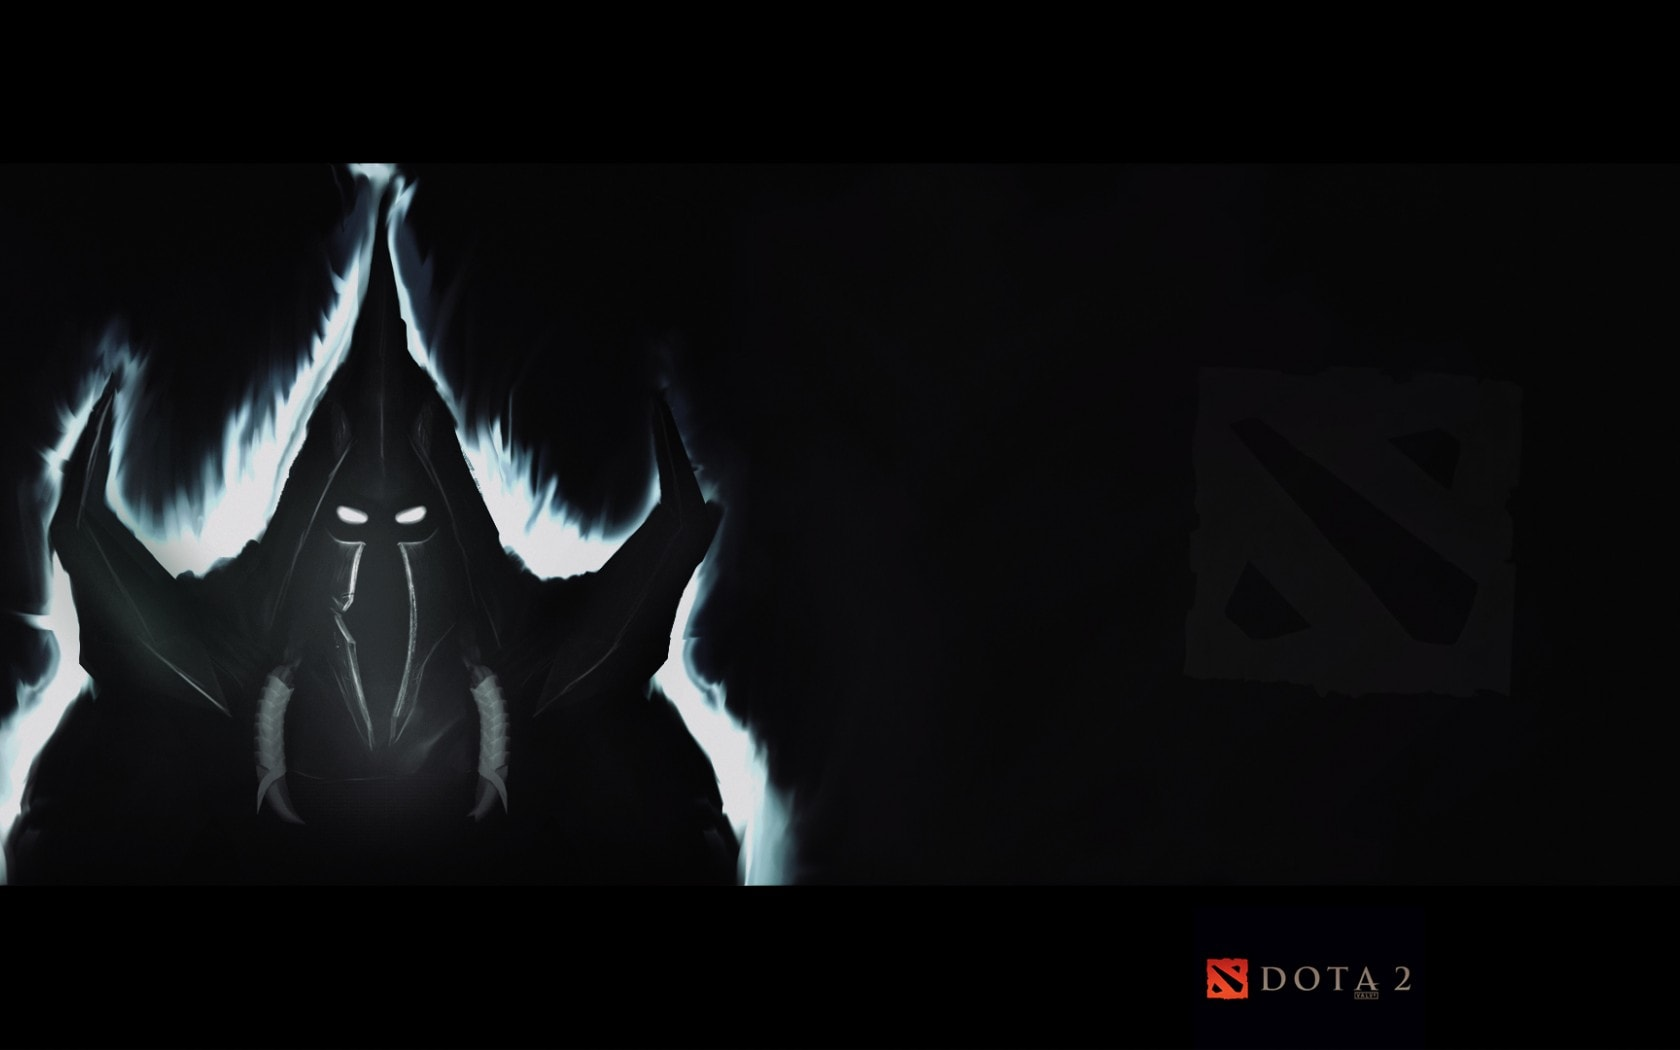 Dota2 : Abaddon widescreen